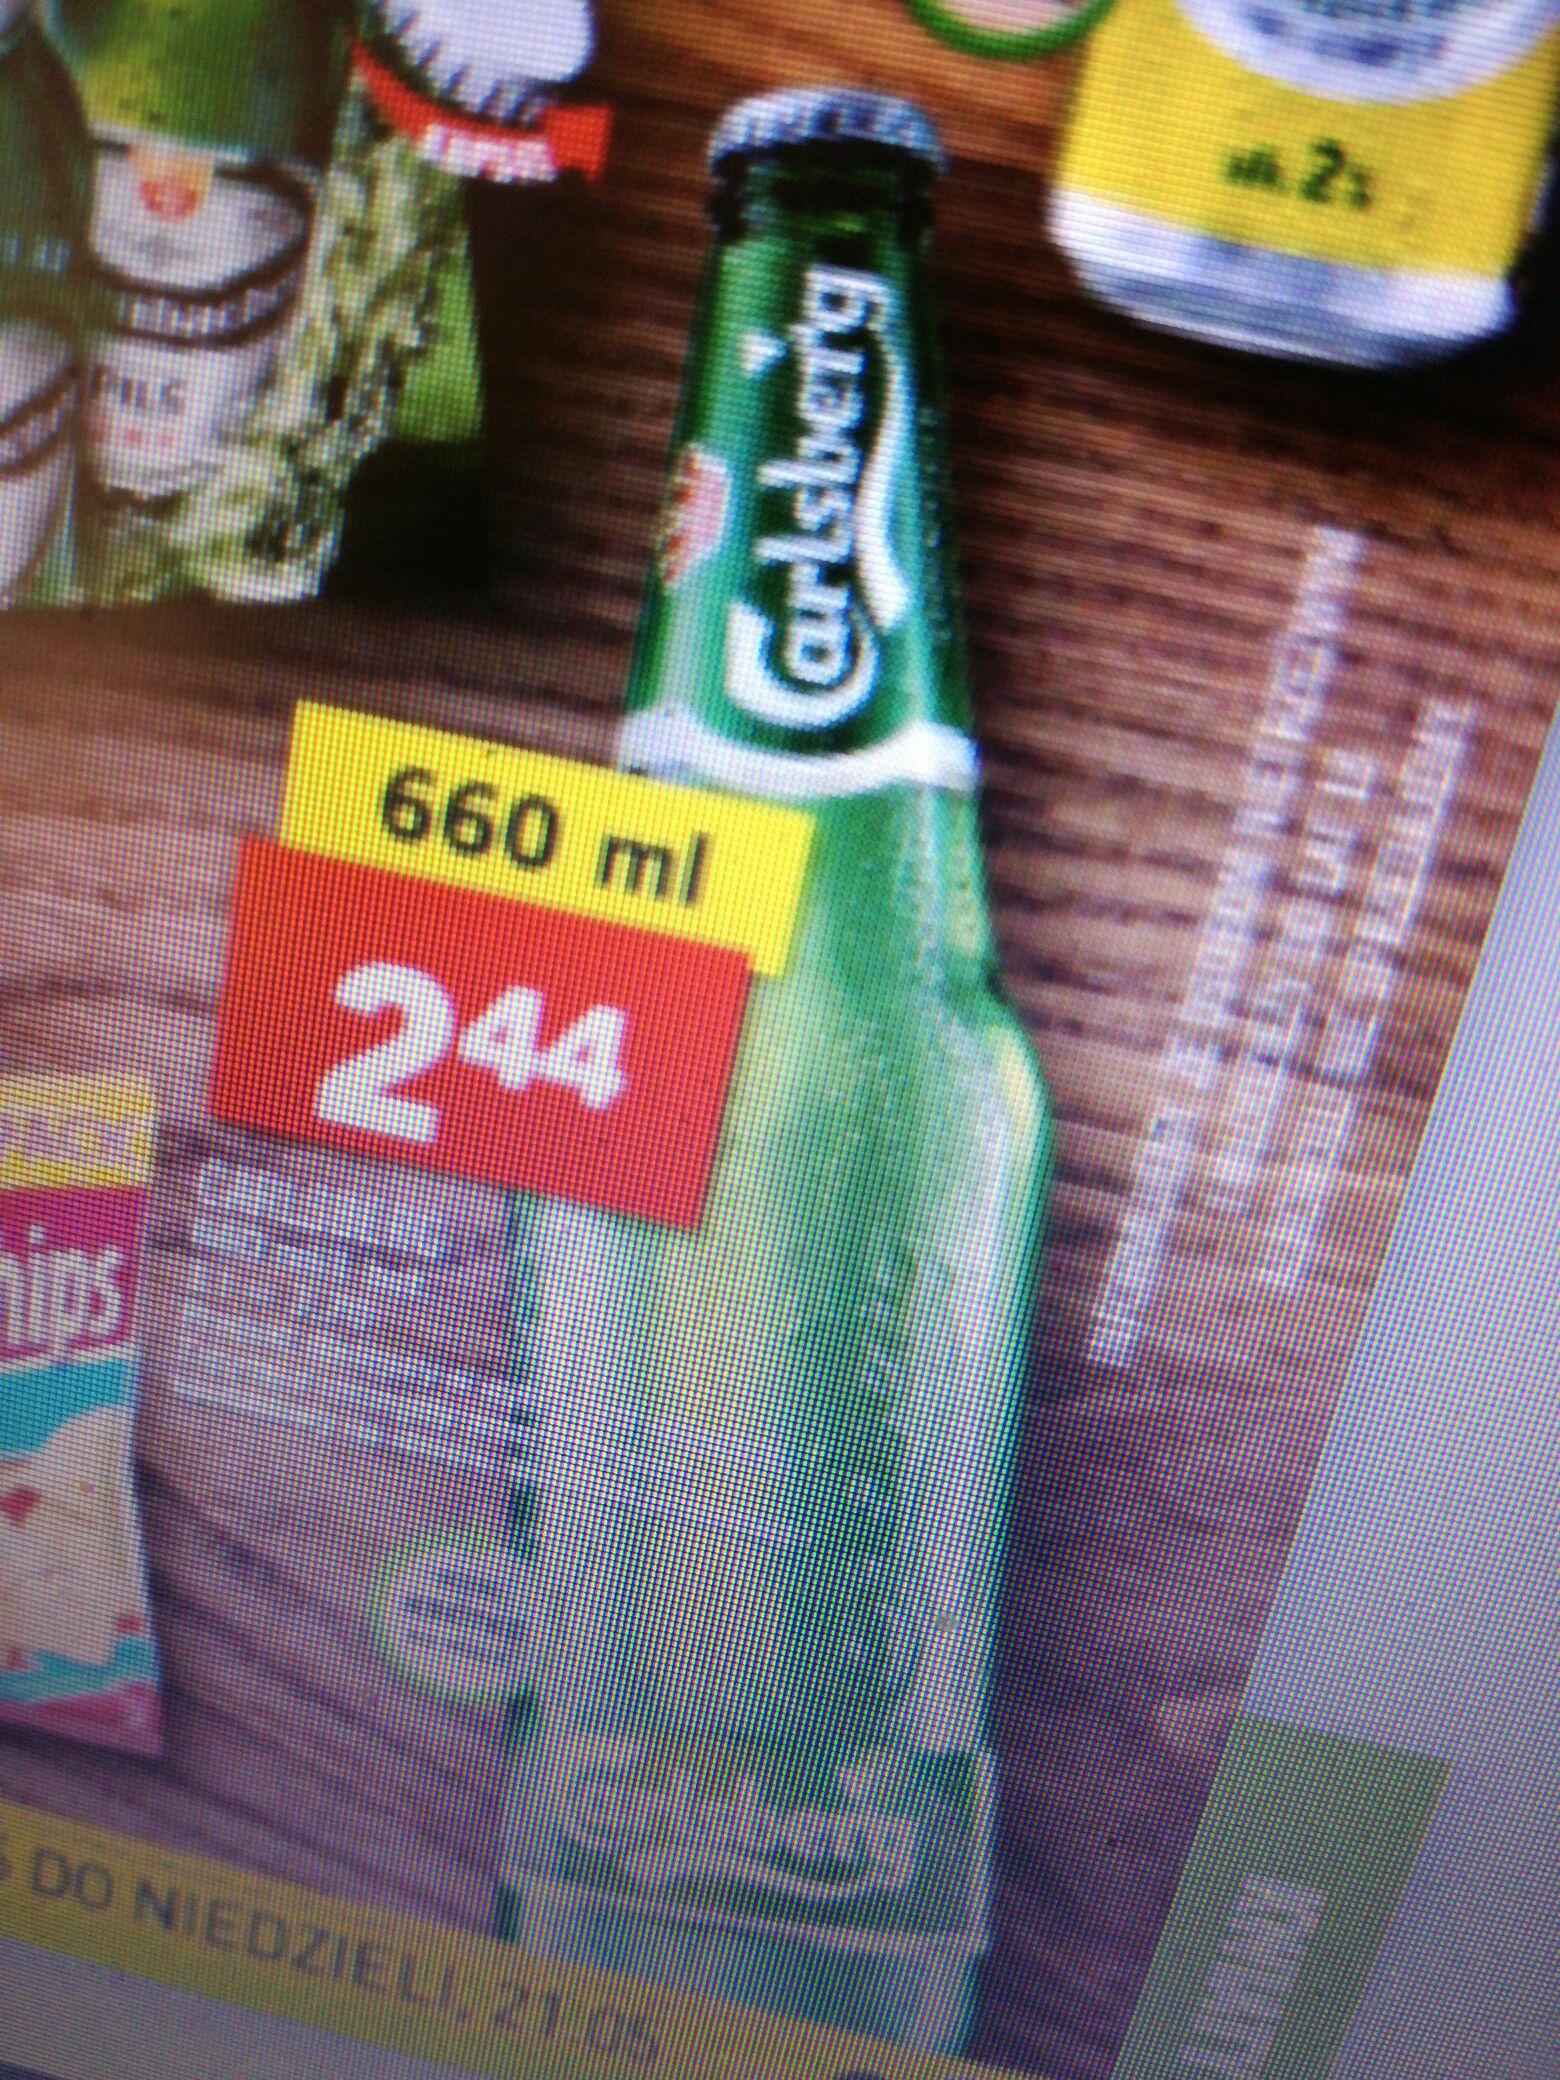 Carlsberg 0.66 w Lidlu